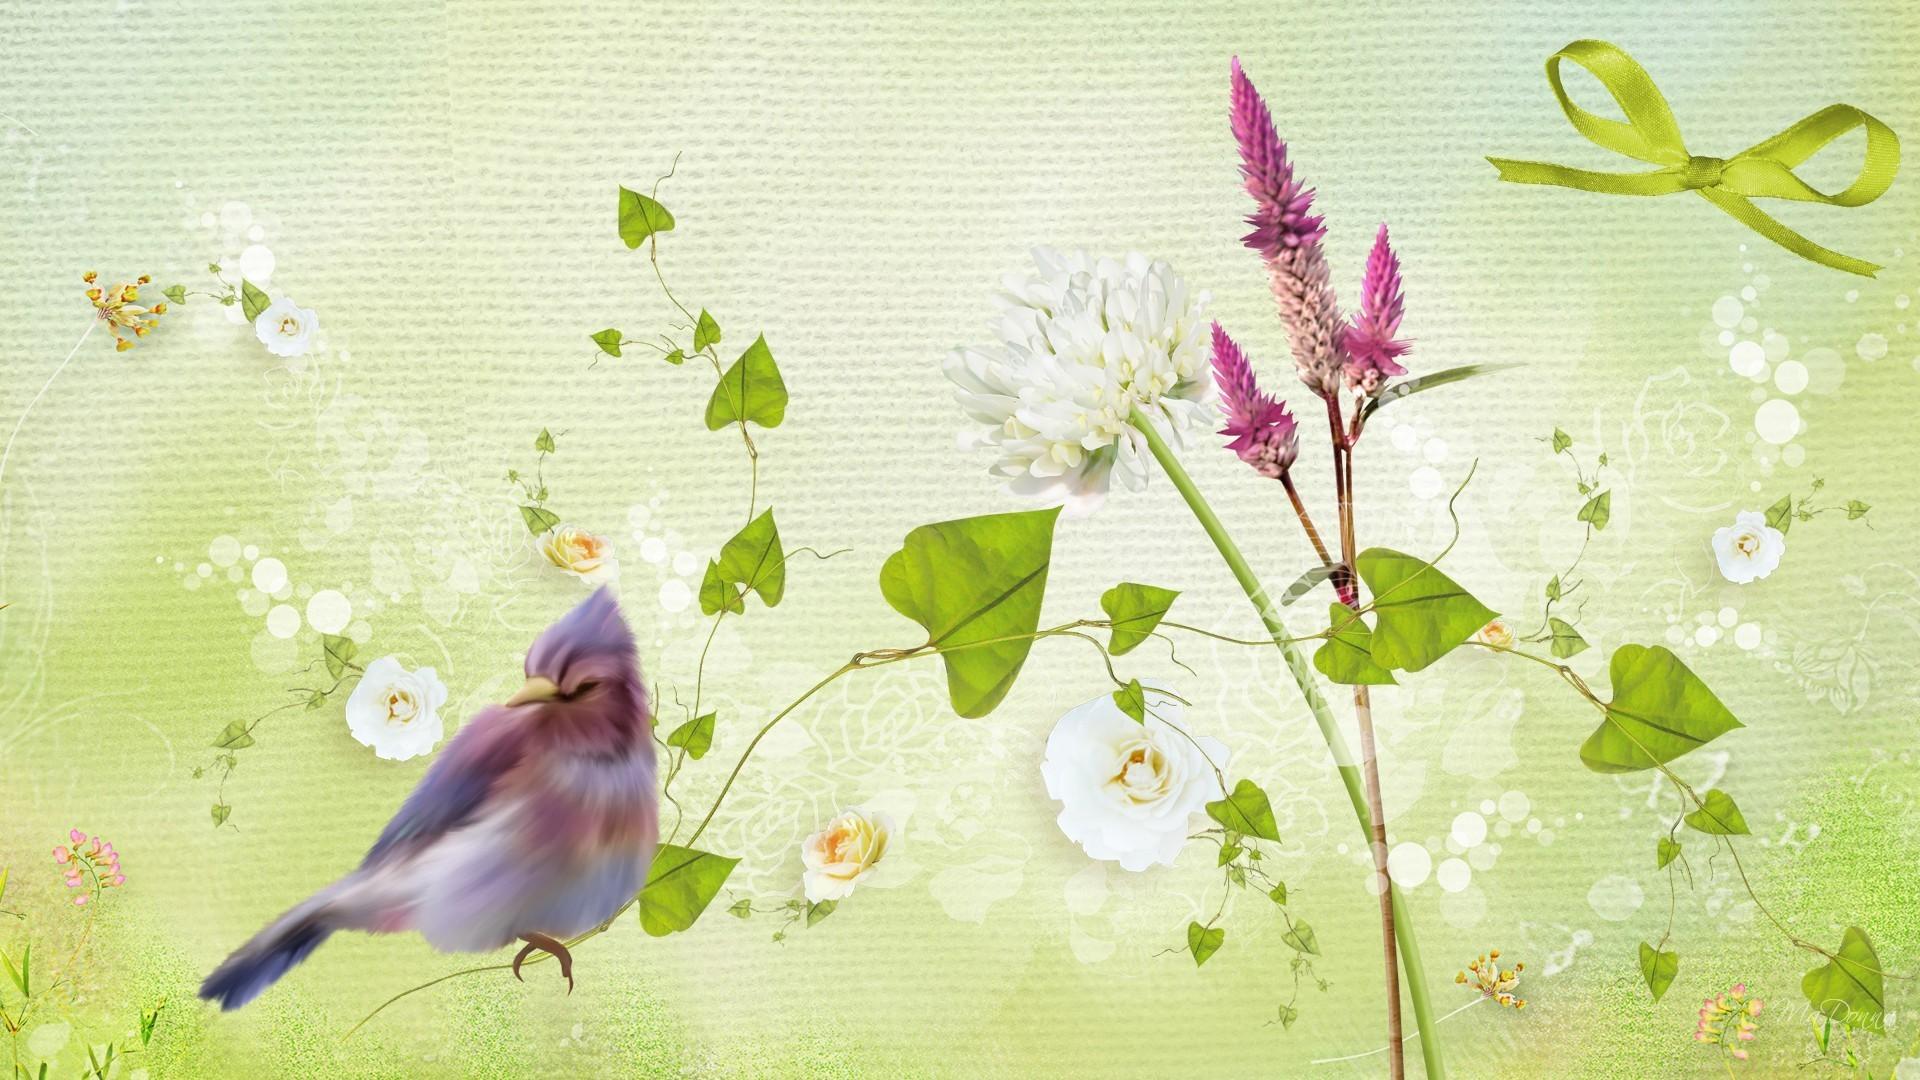 Flowers – April Ribbon Bird Summer Purple Clover Spring Roses Green Colors  Abstract Flower Desktop Wallpaper